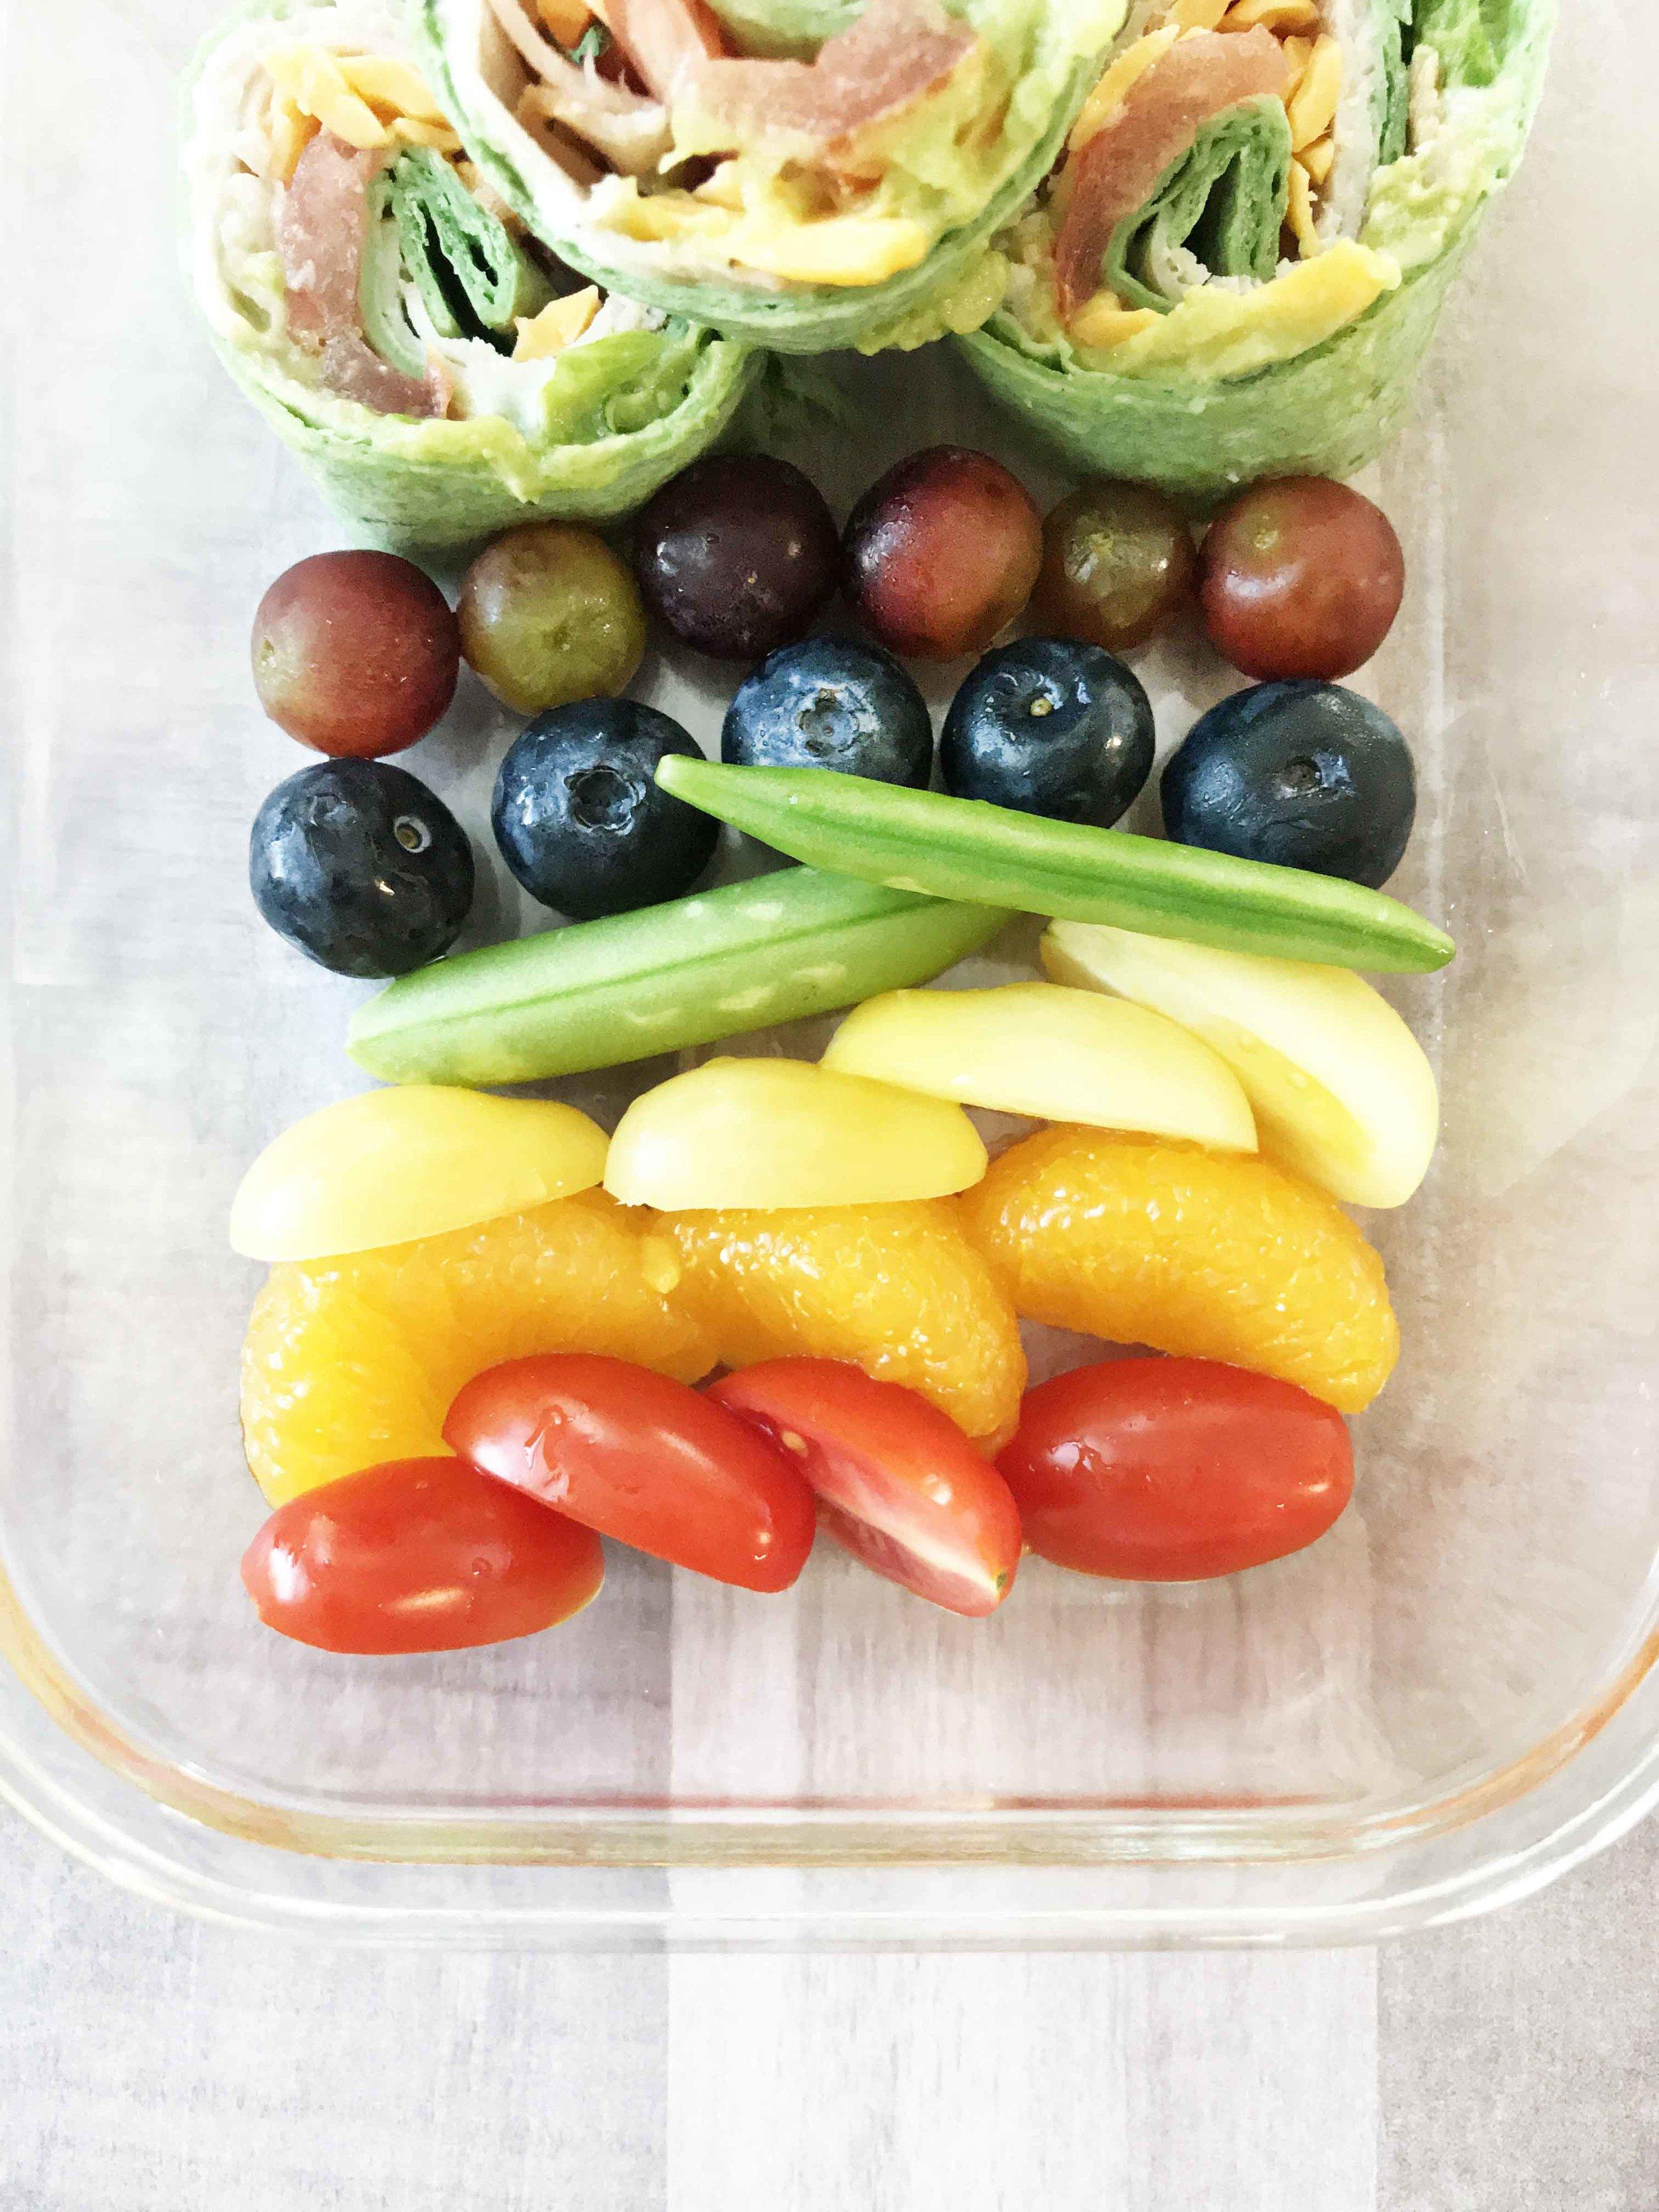 rainbow-wrap-lunch7.jpg